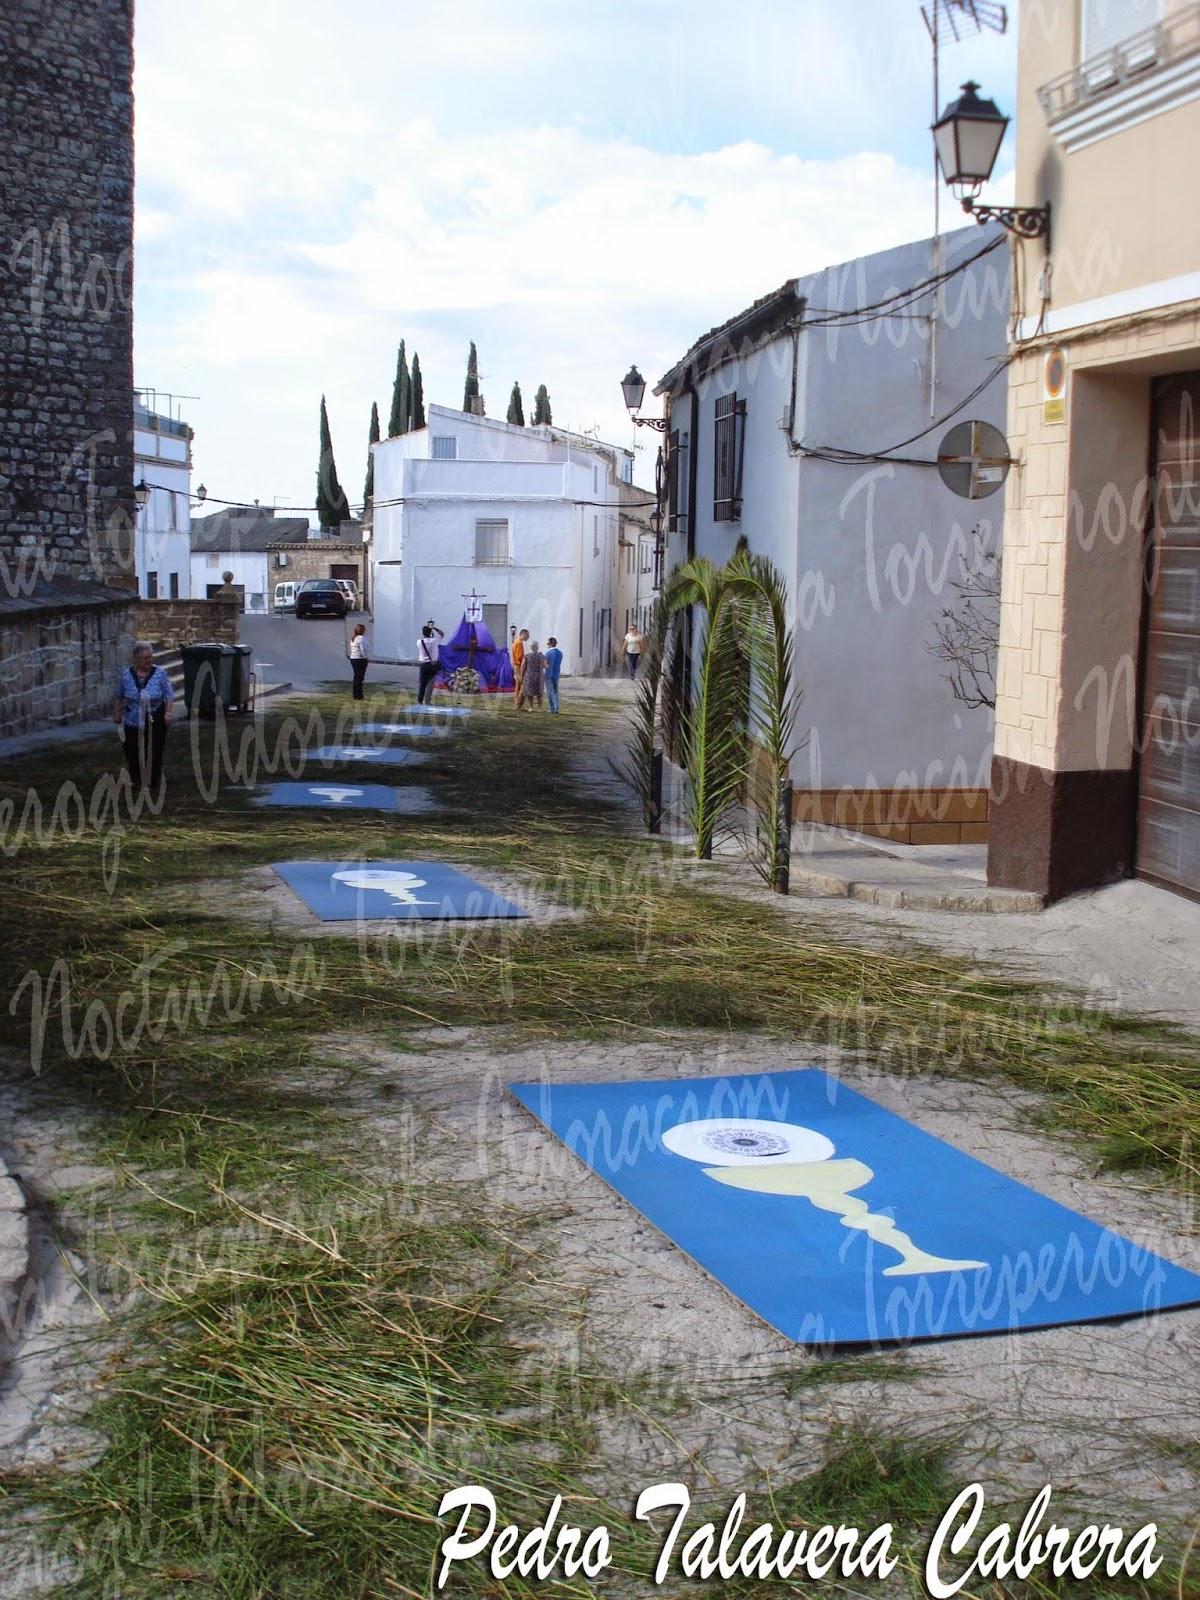 http://adnoctdetorreperogil.blogspot.com.es/